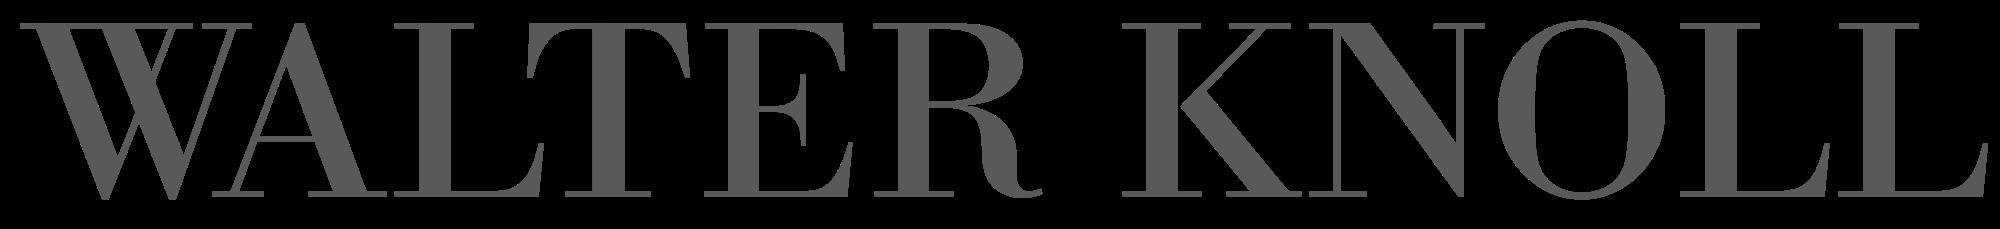 Logo Walter Knoll AG & Co. KG